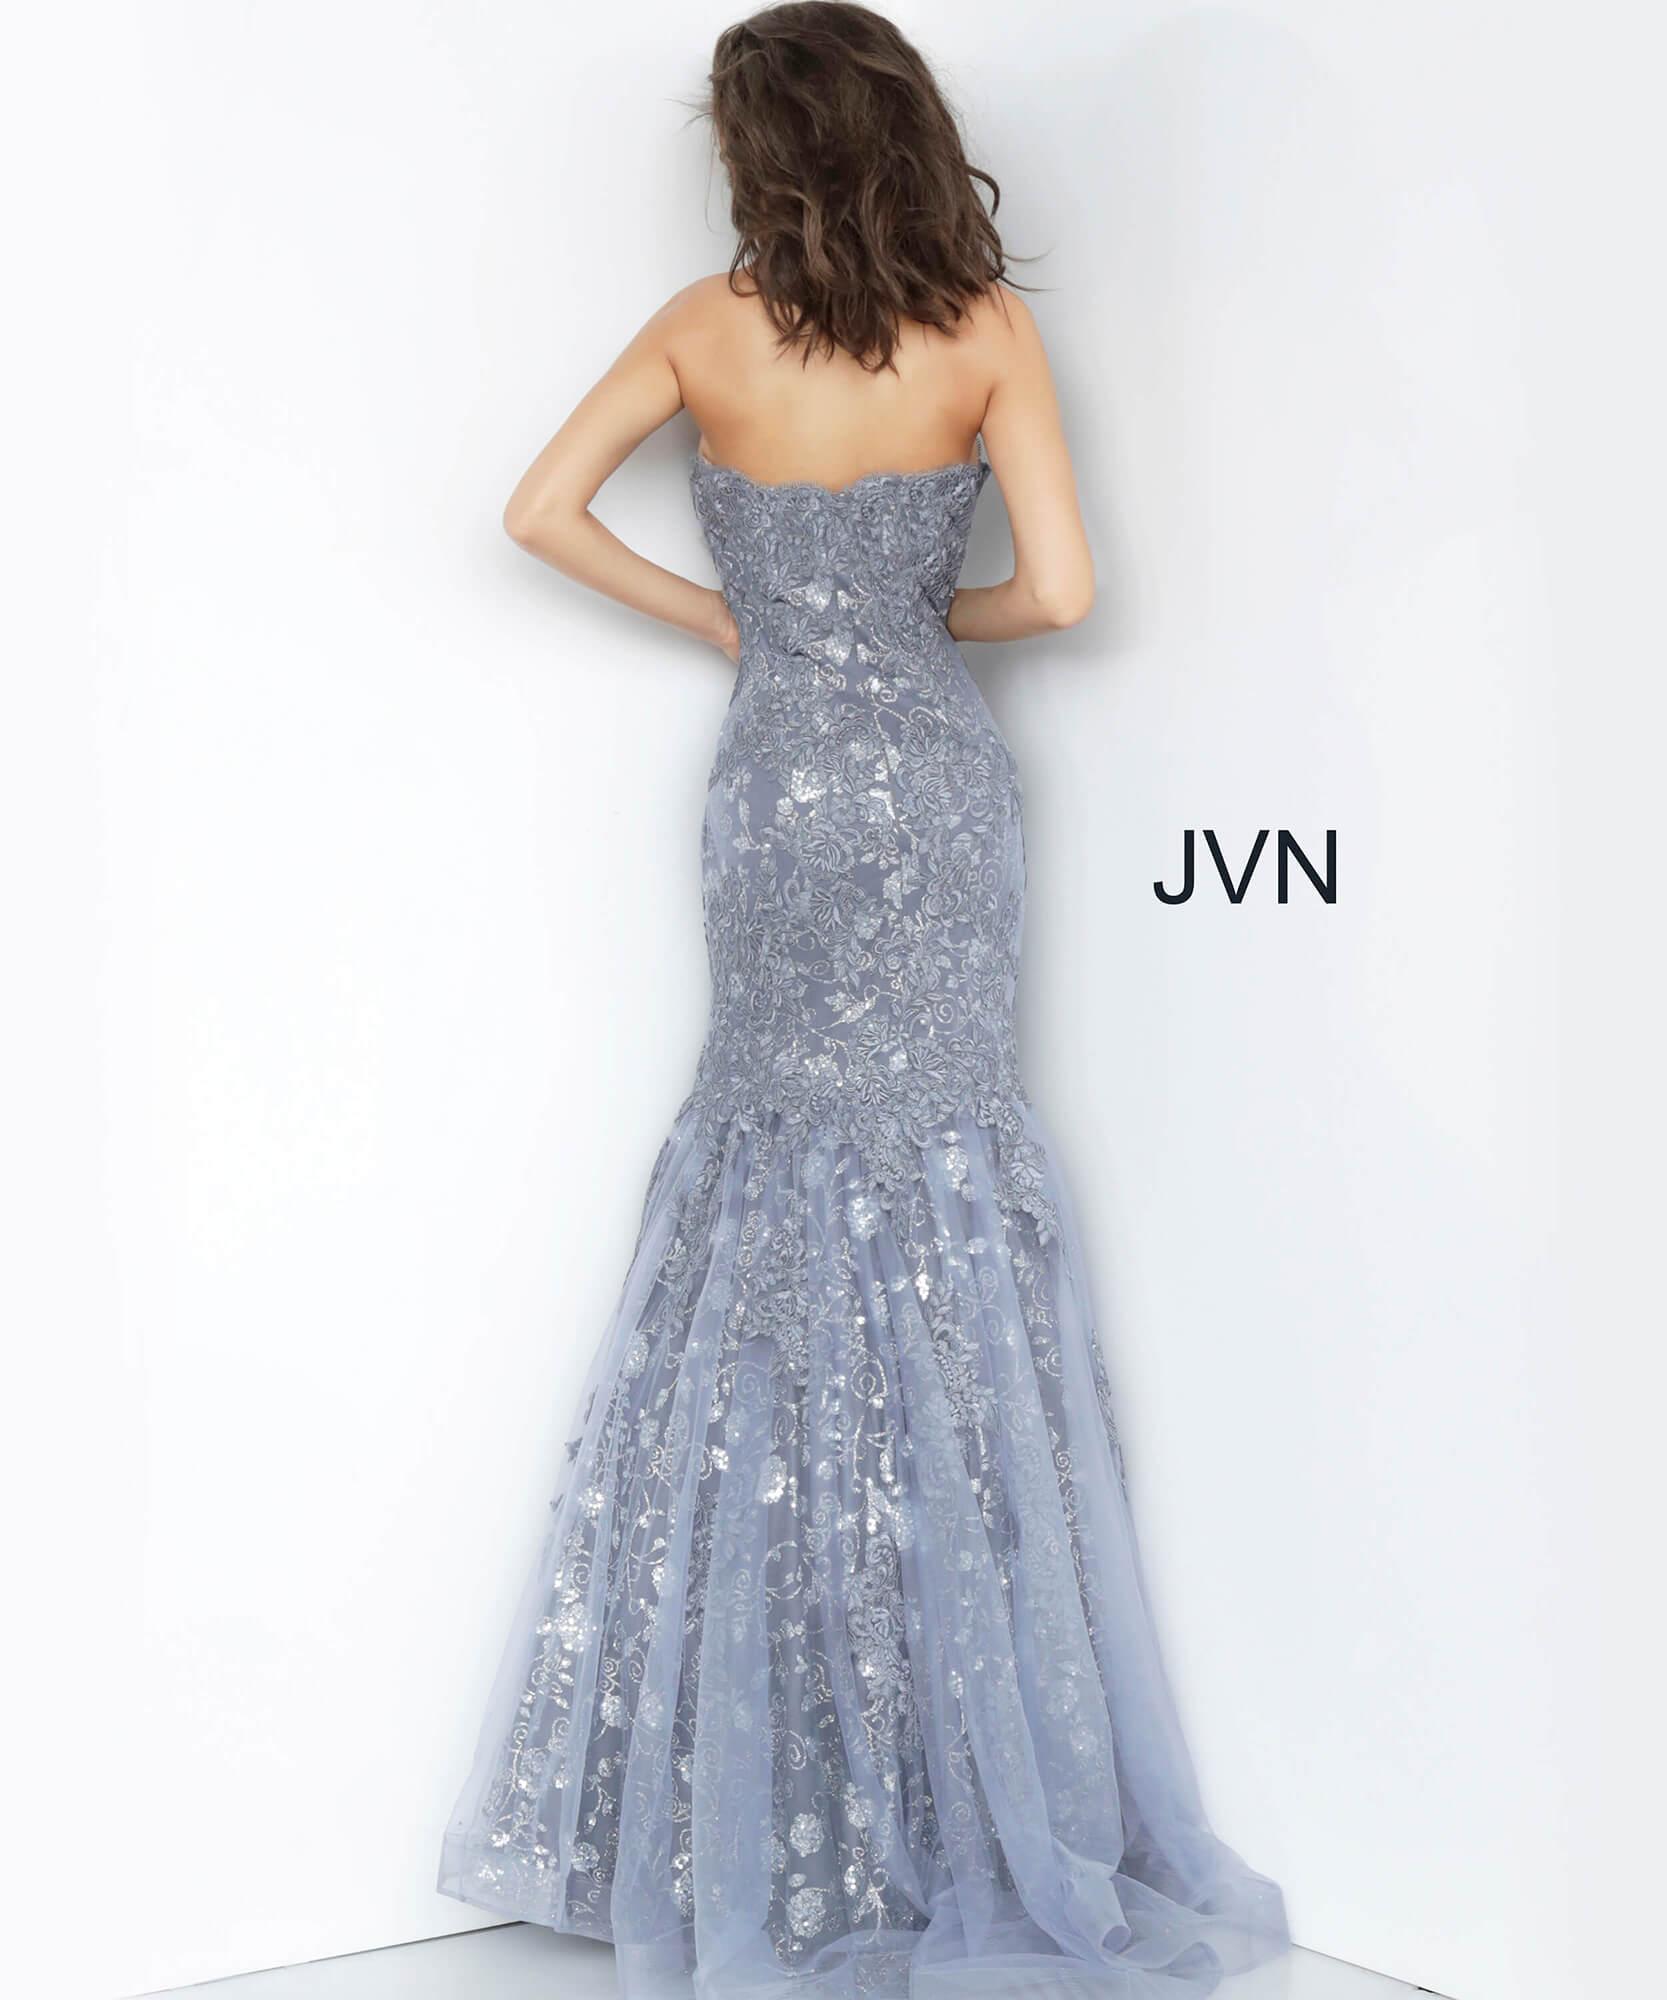 bridesmaids mermaid dress Sweetheart mermaid prom dress